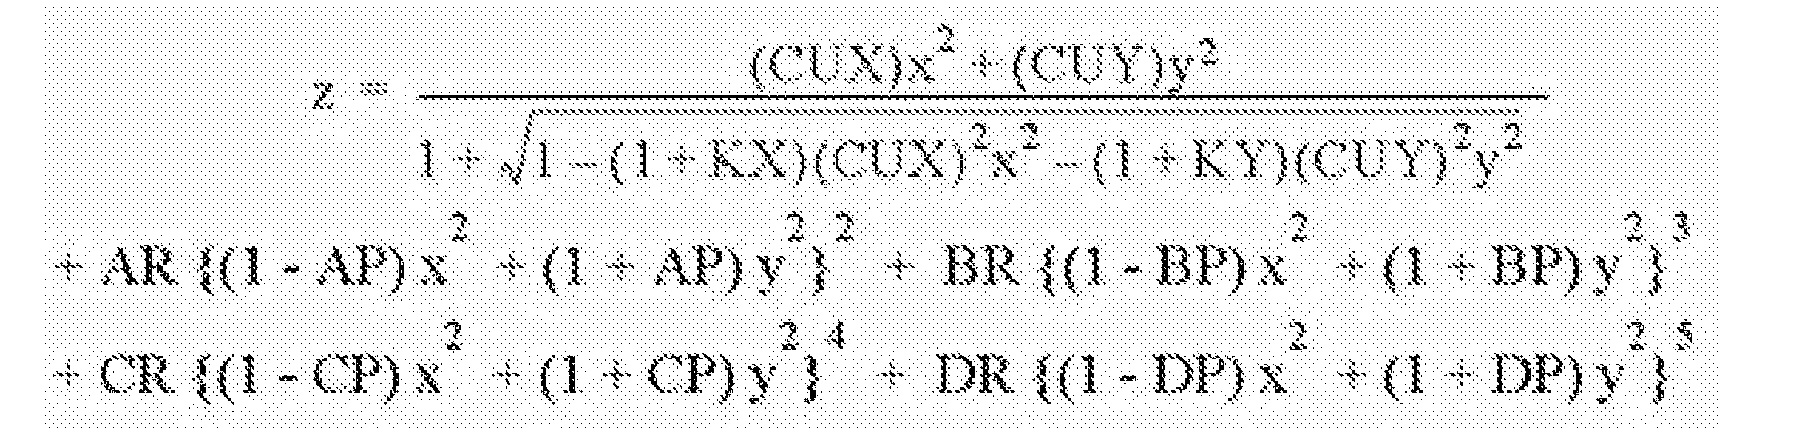 Figure CN205880874UD00051